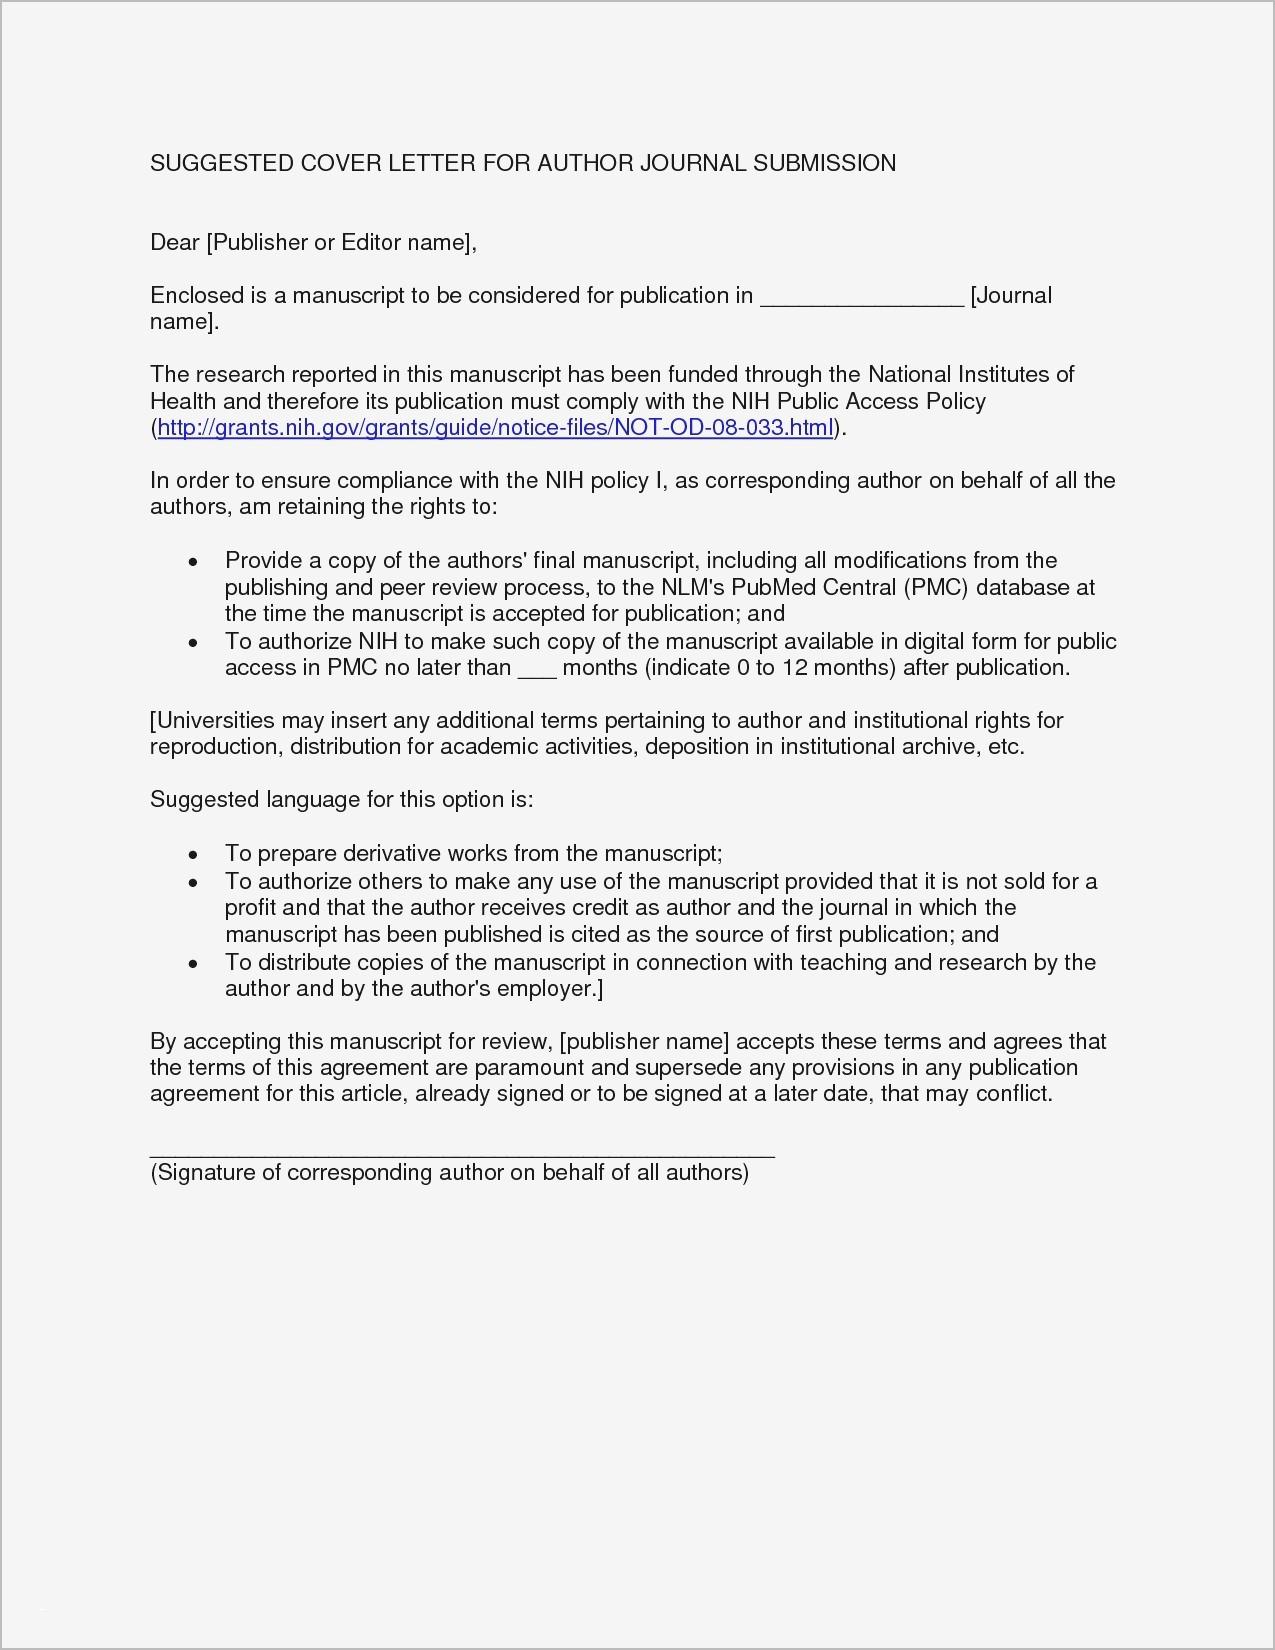 Resume Cover Letter Template Pdf - Basic Resume Cover Letter Template New Fax Cover Letter Sample Pdf